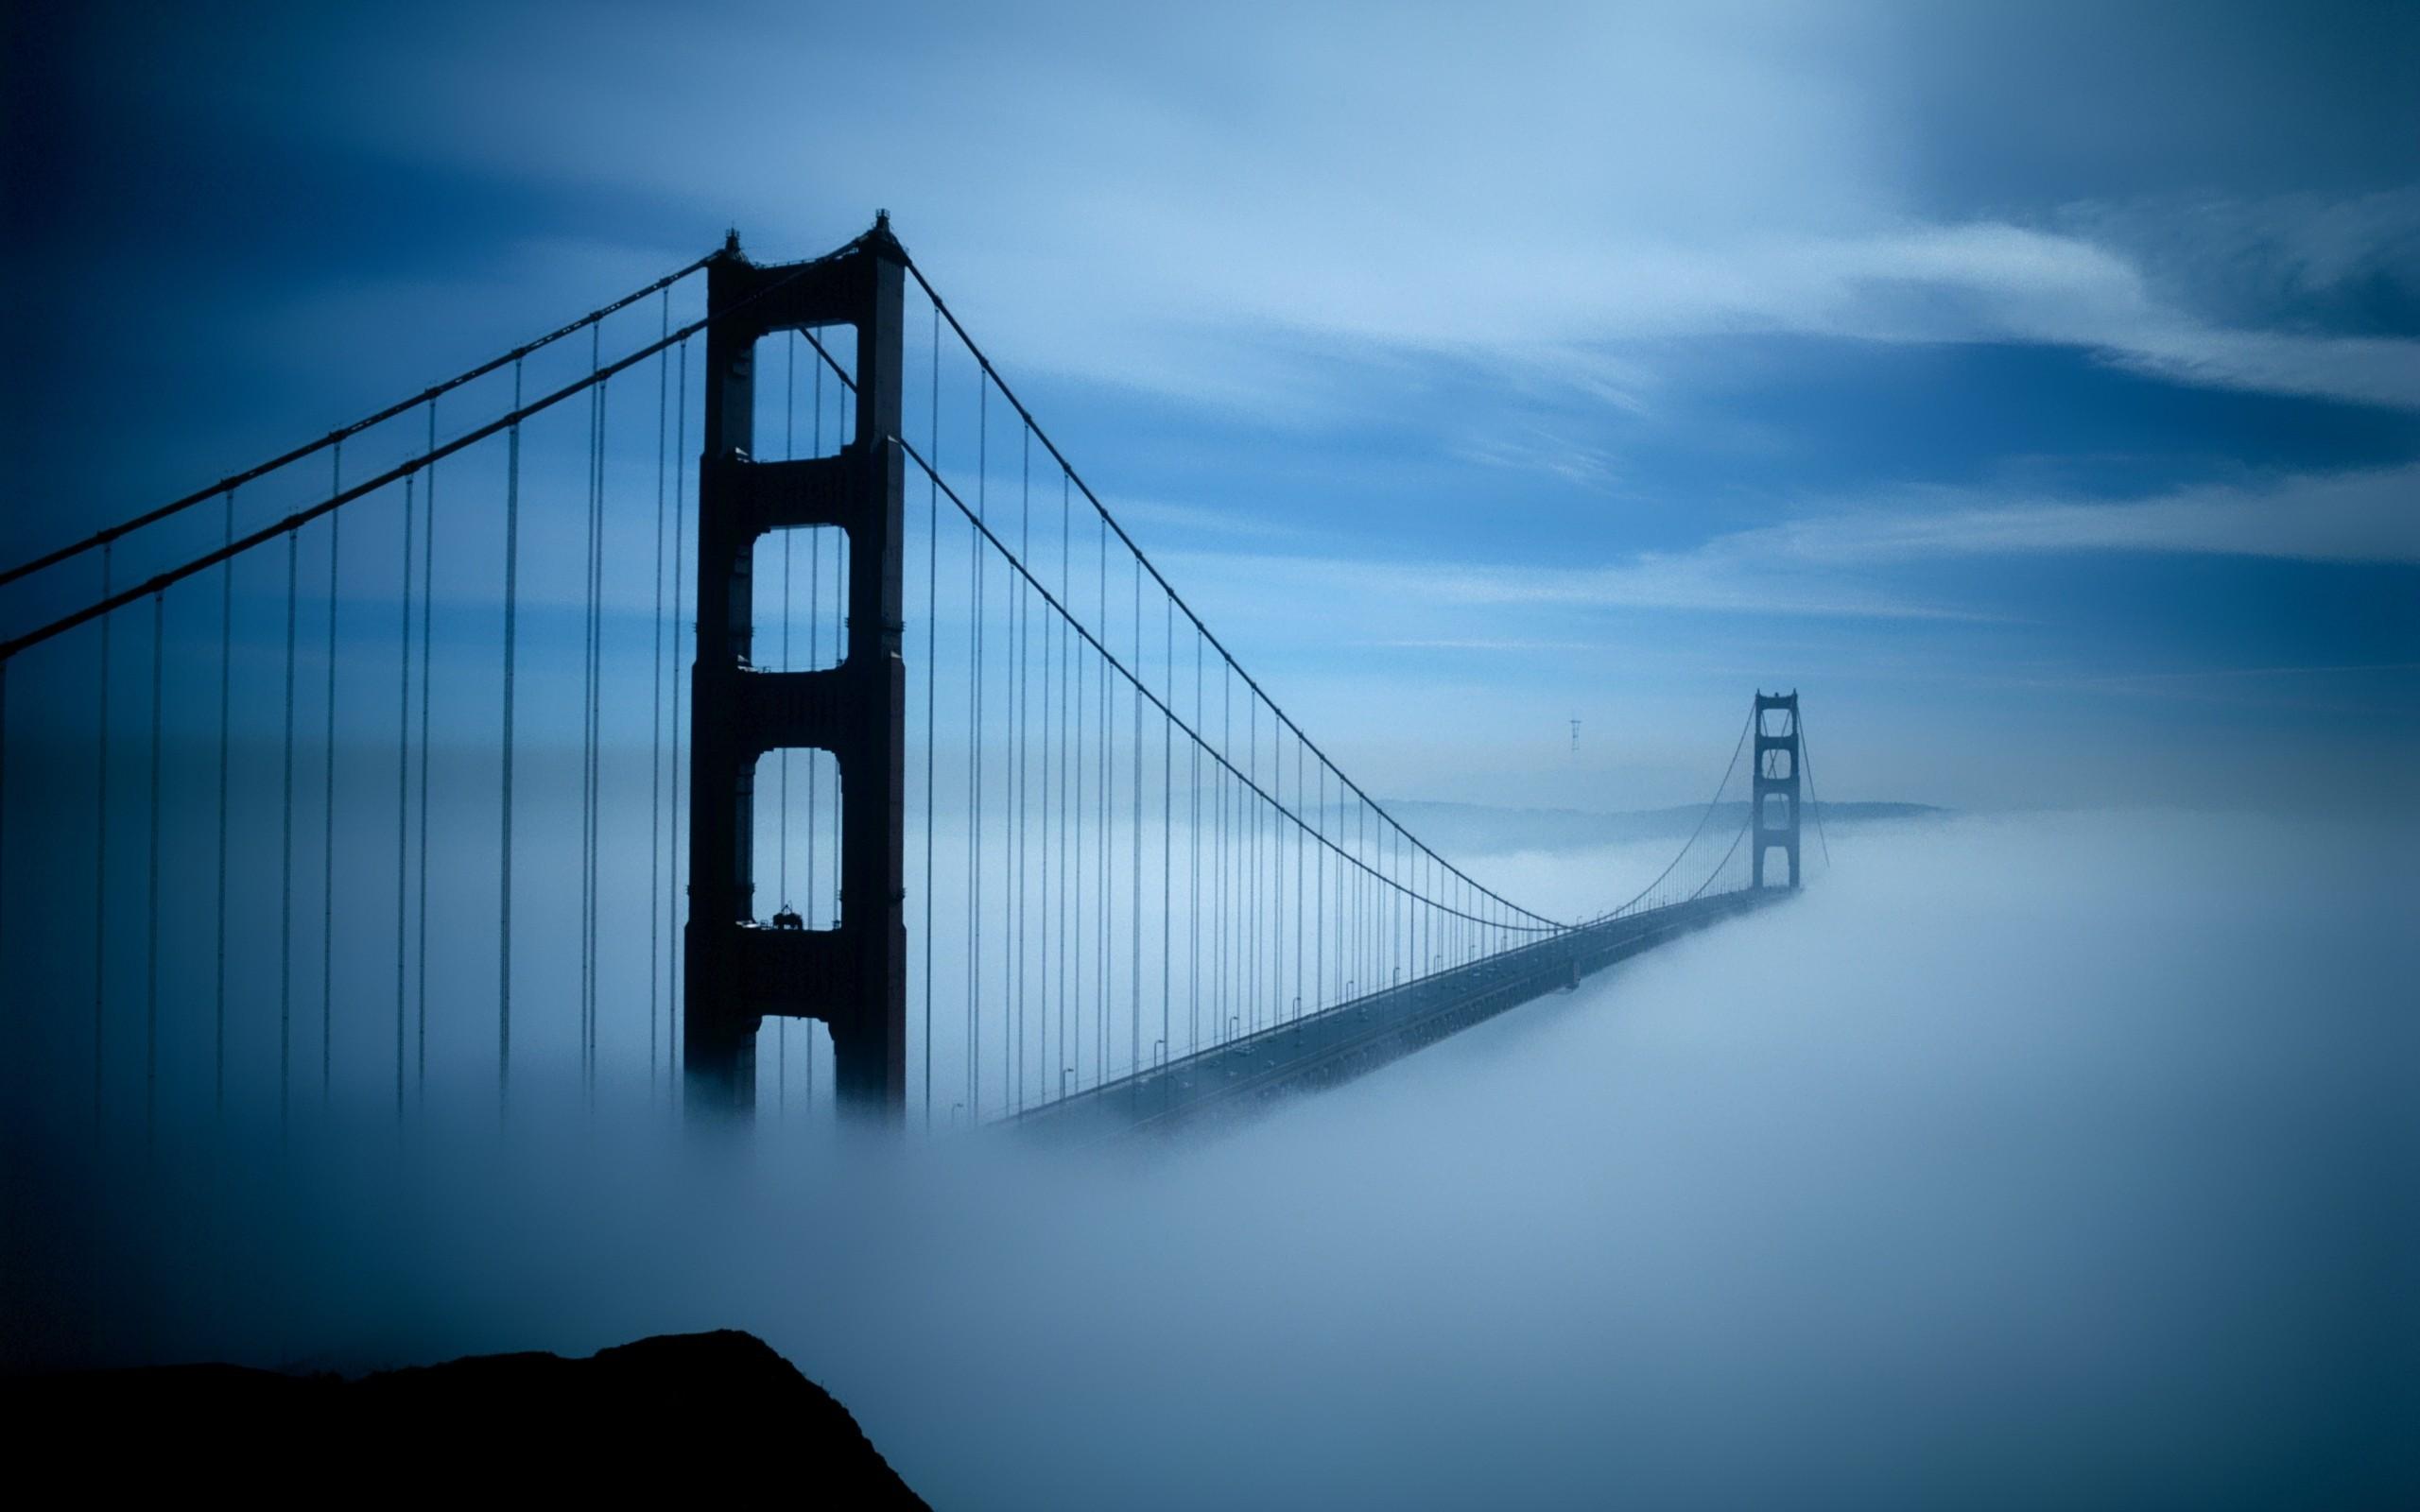 Download Wallpaper Macbook San Francisco - golden-gate-bridge-san-francisco  2018_968077.jpg